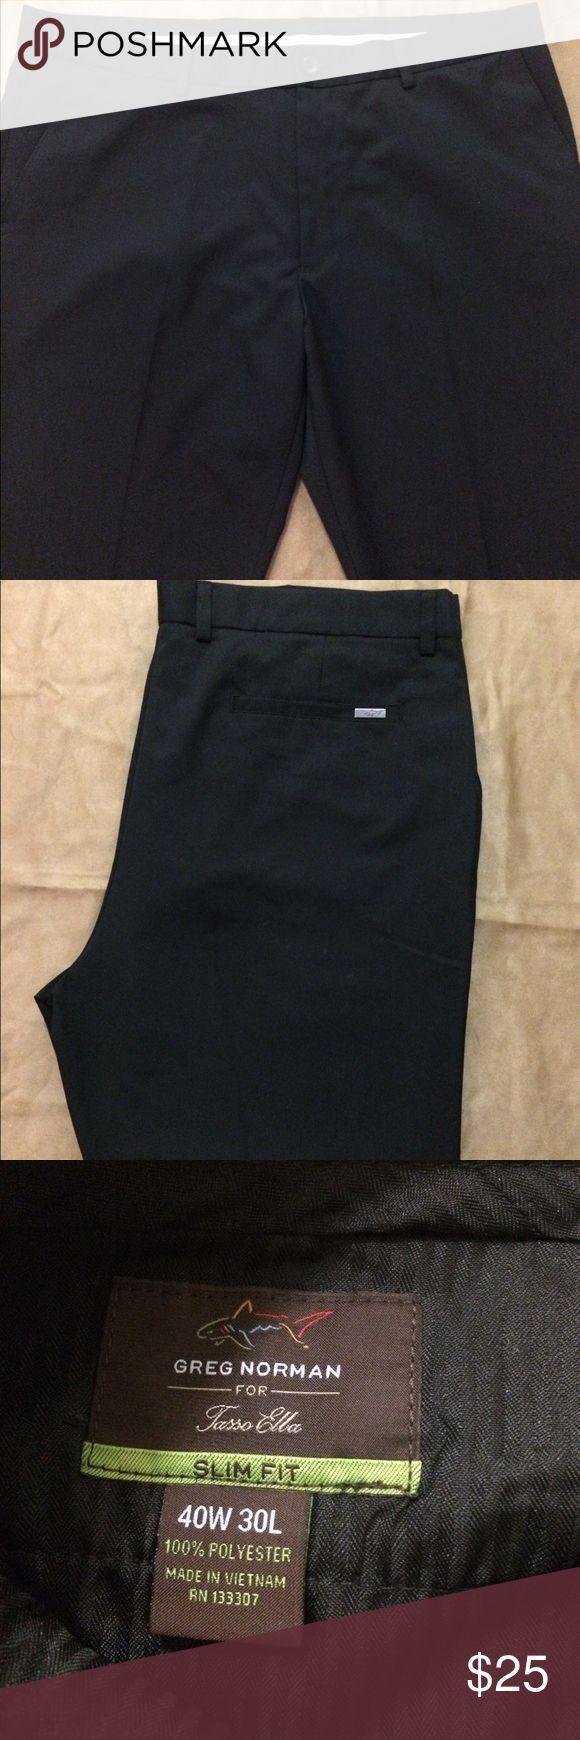 Greg Norman Slim Fit Golf Pants Greg Norman for Tasso Elba Men's Slim Fit Golf Pants  Size 40W 30L Greg Norman Pants Dress #GolfPants